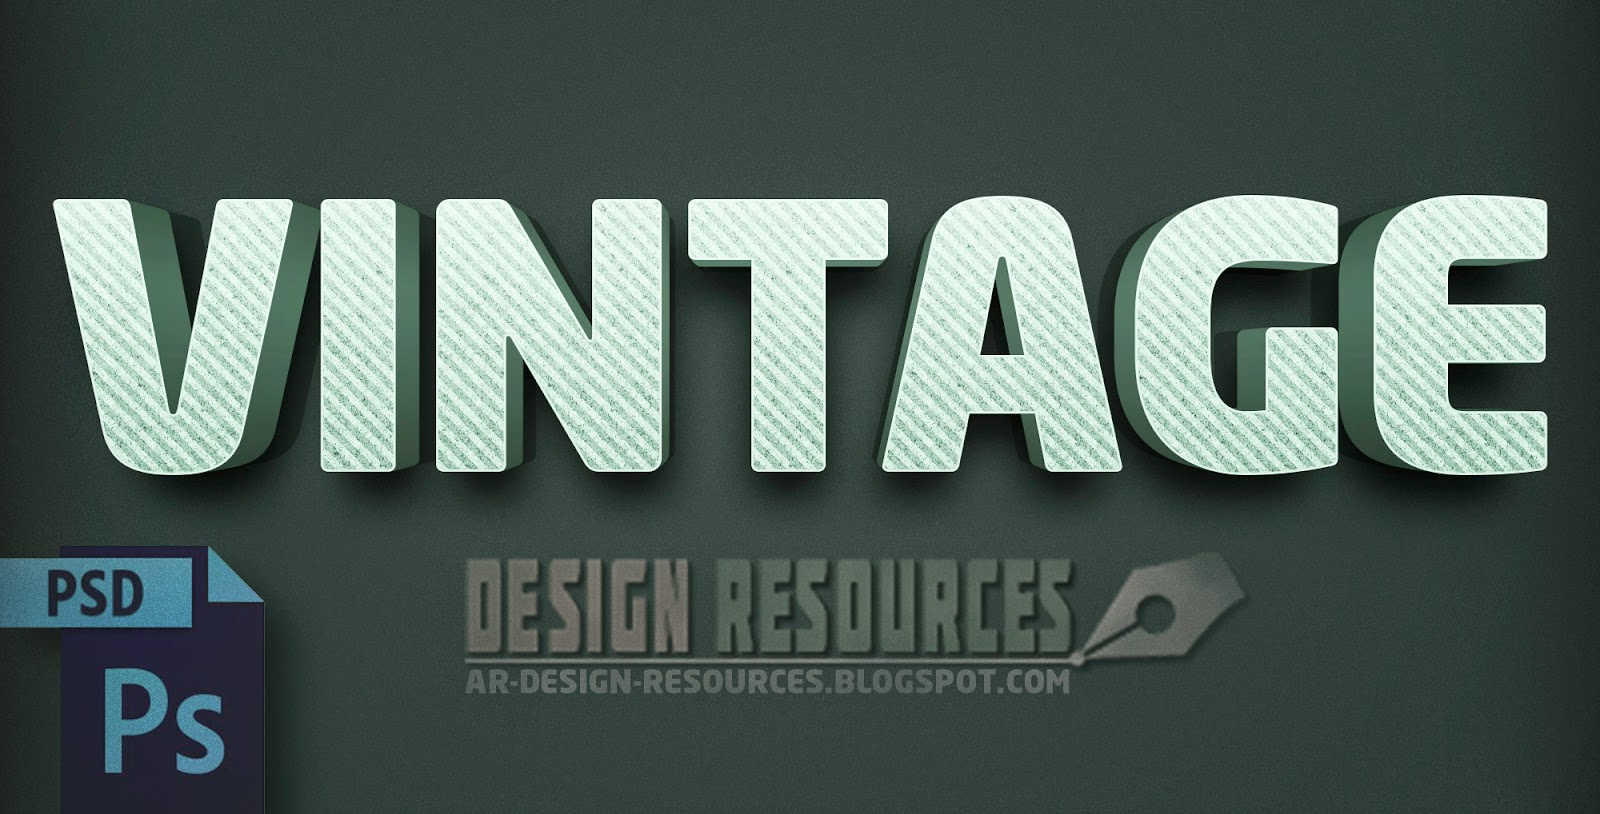 http://3.bp.blogspot.com/-UDr1GG1mXlY/VDgttQdkNgI/AAAAAAAAA_E/Jlmo0YSZ-VM/s1600/Vintage_Text_Effect.jpg